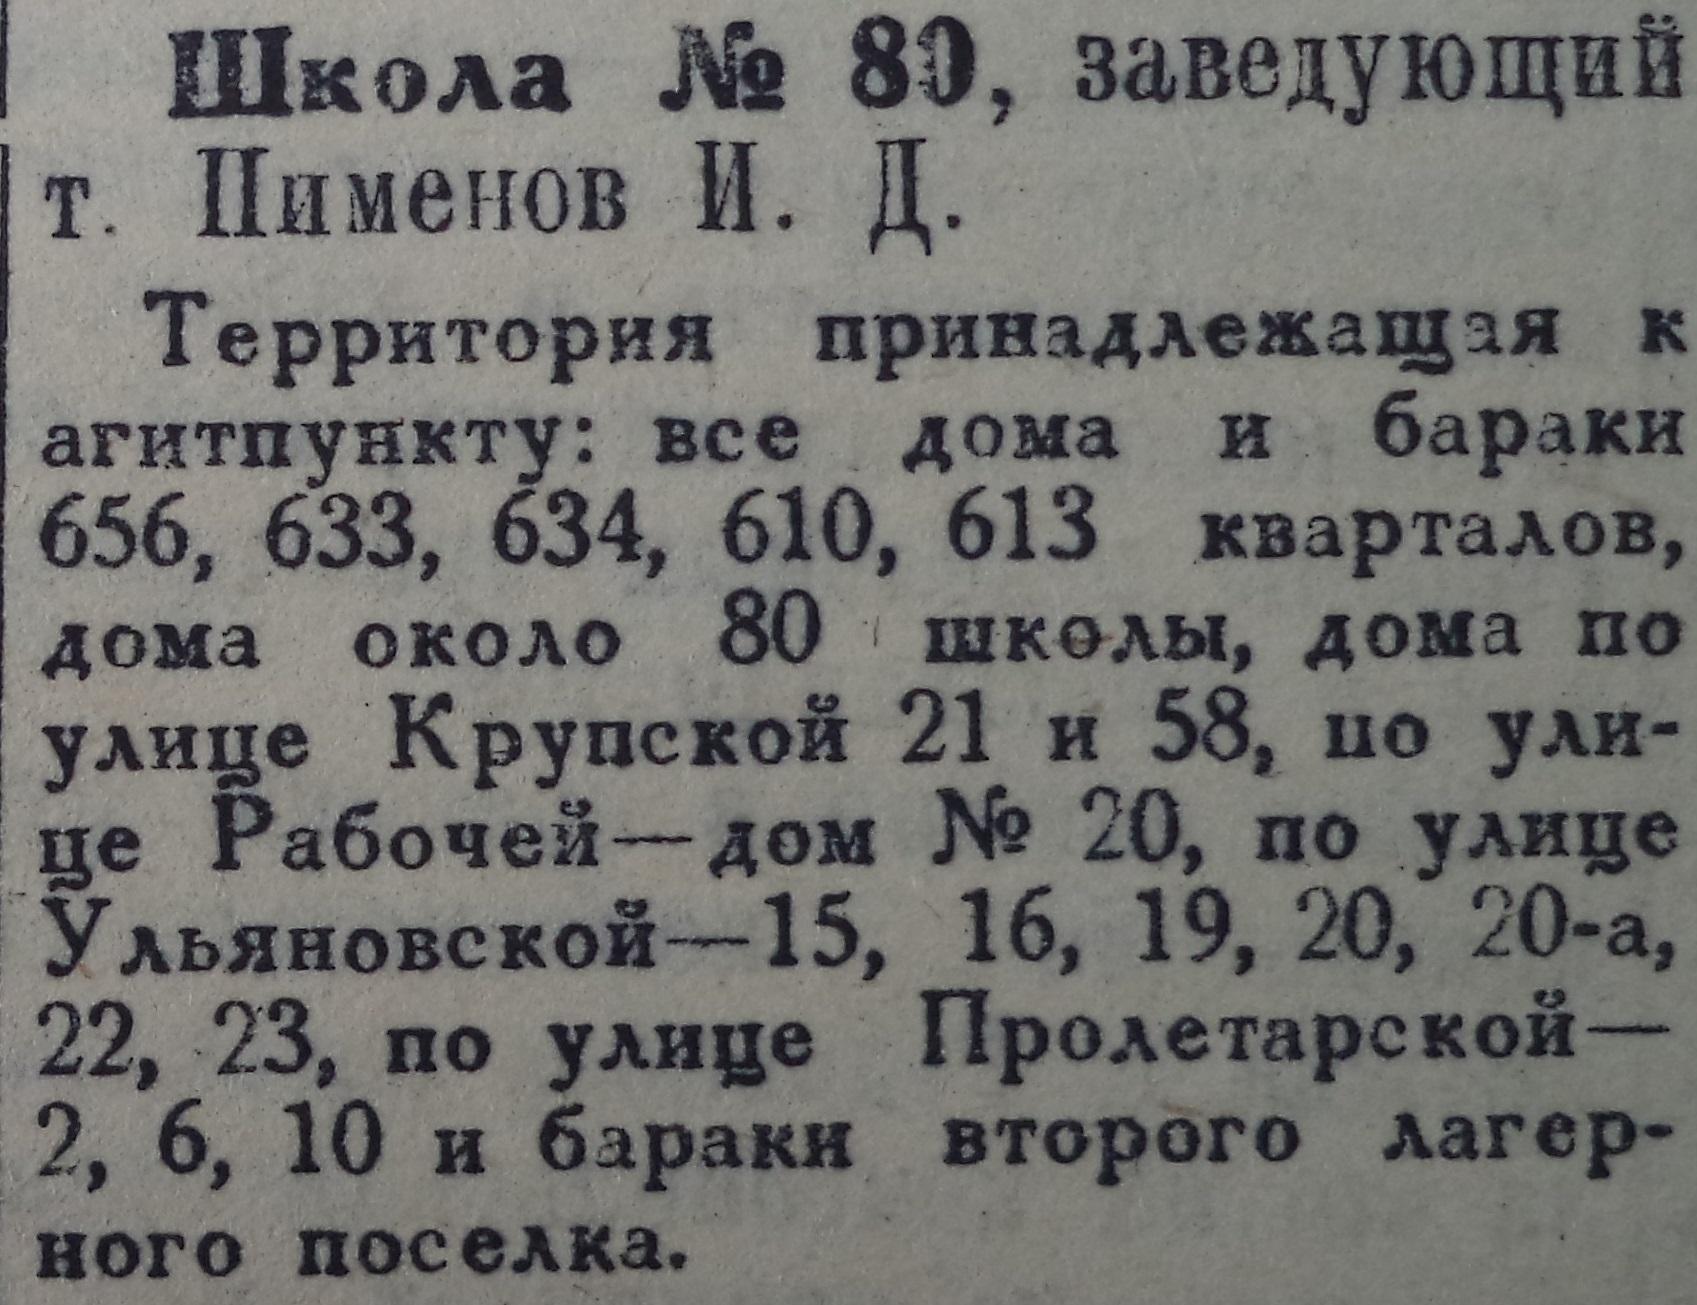 ФОТО 09-АМатросова-За сталинский план-1948-25 ноября-агитпункт школы № 80